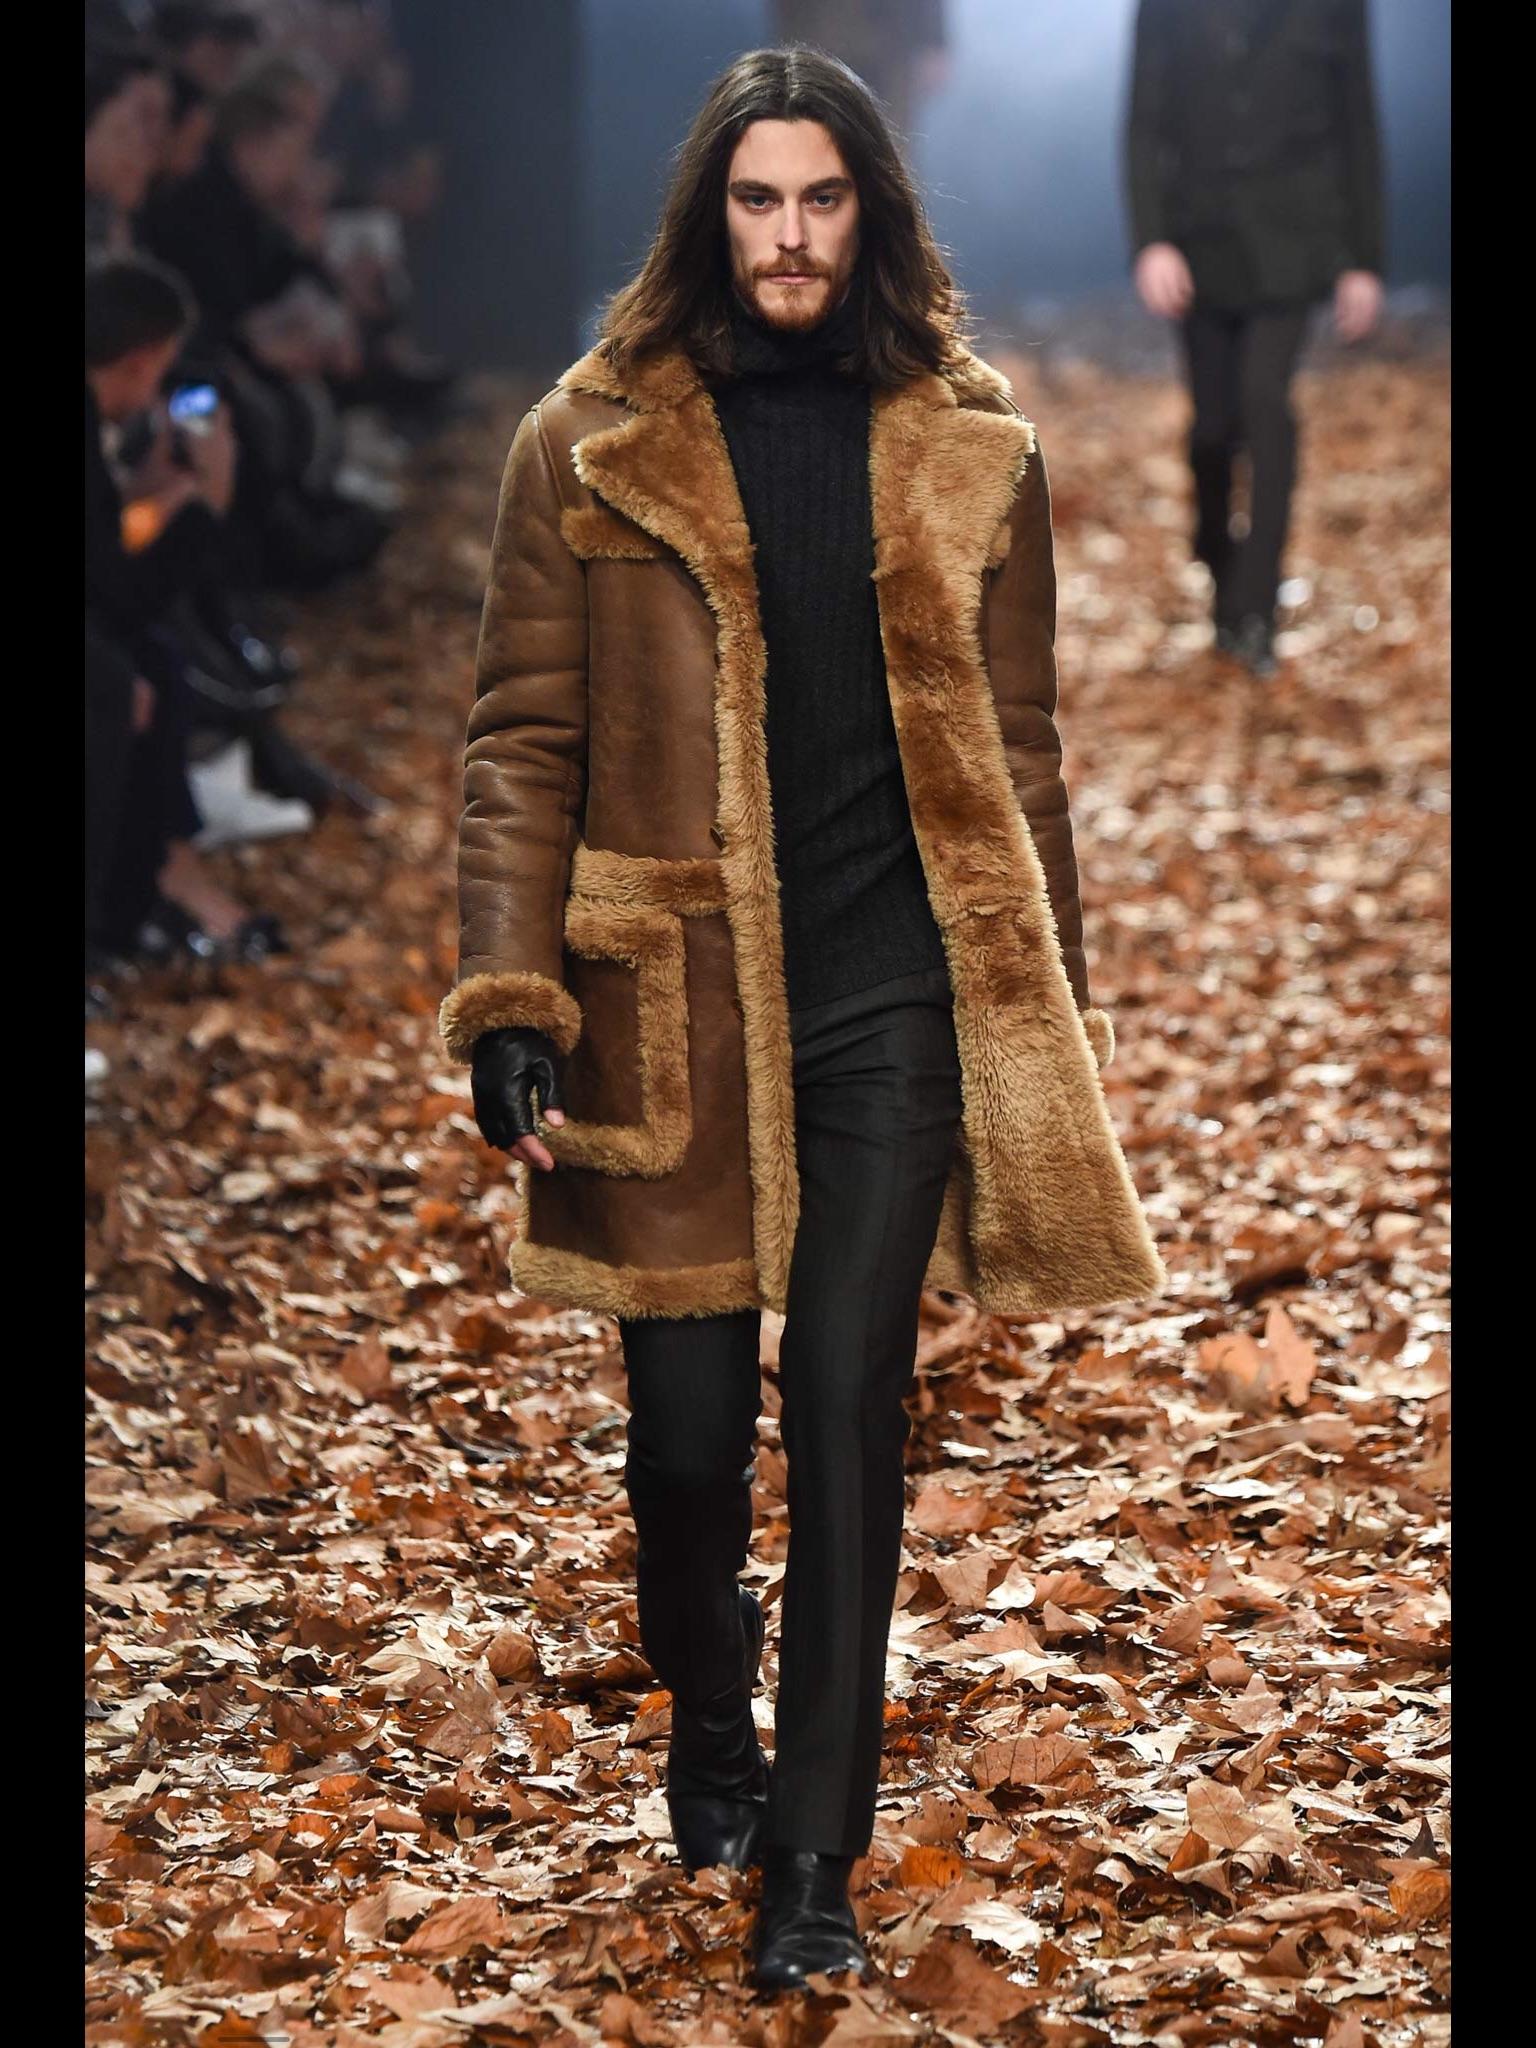 Milan Menswear Shows Hightlights – Autumn/Winter 2015